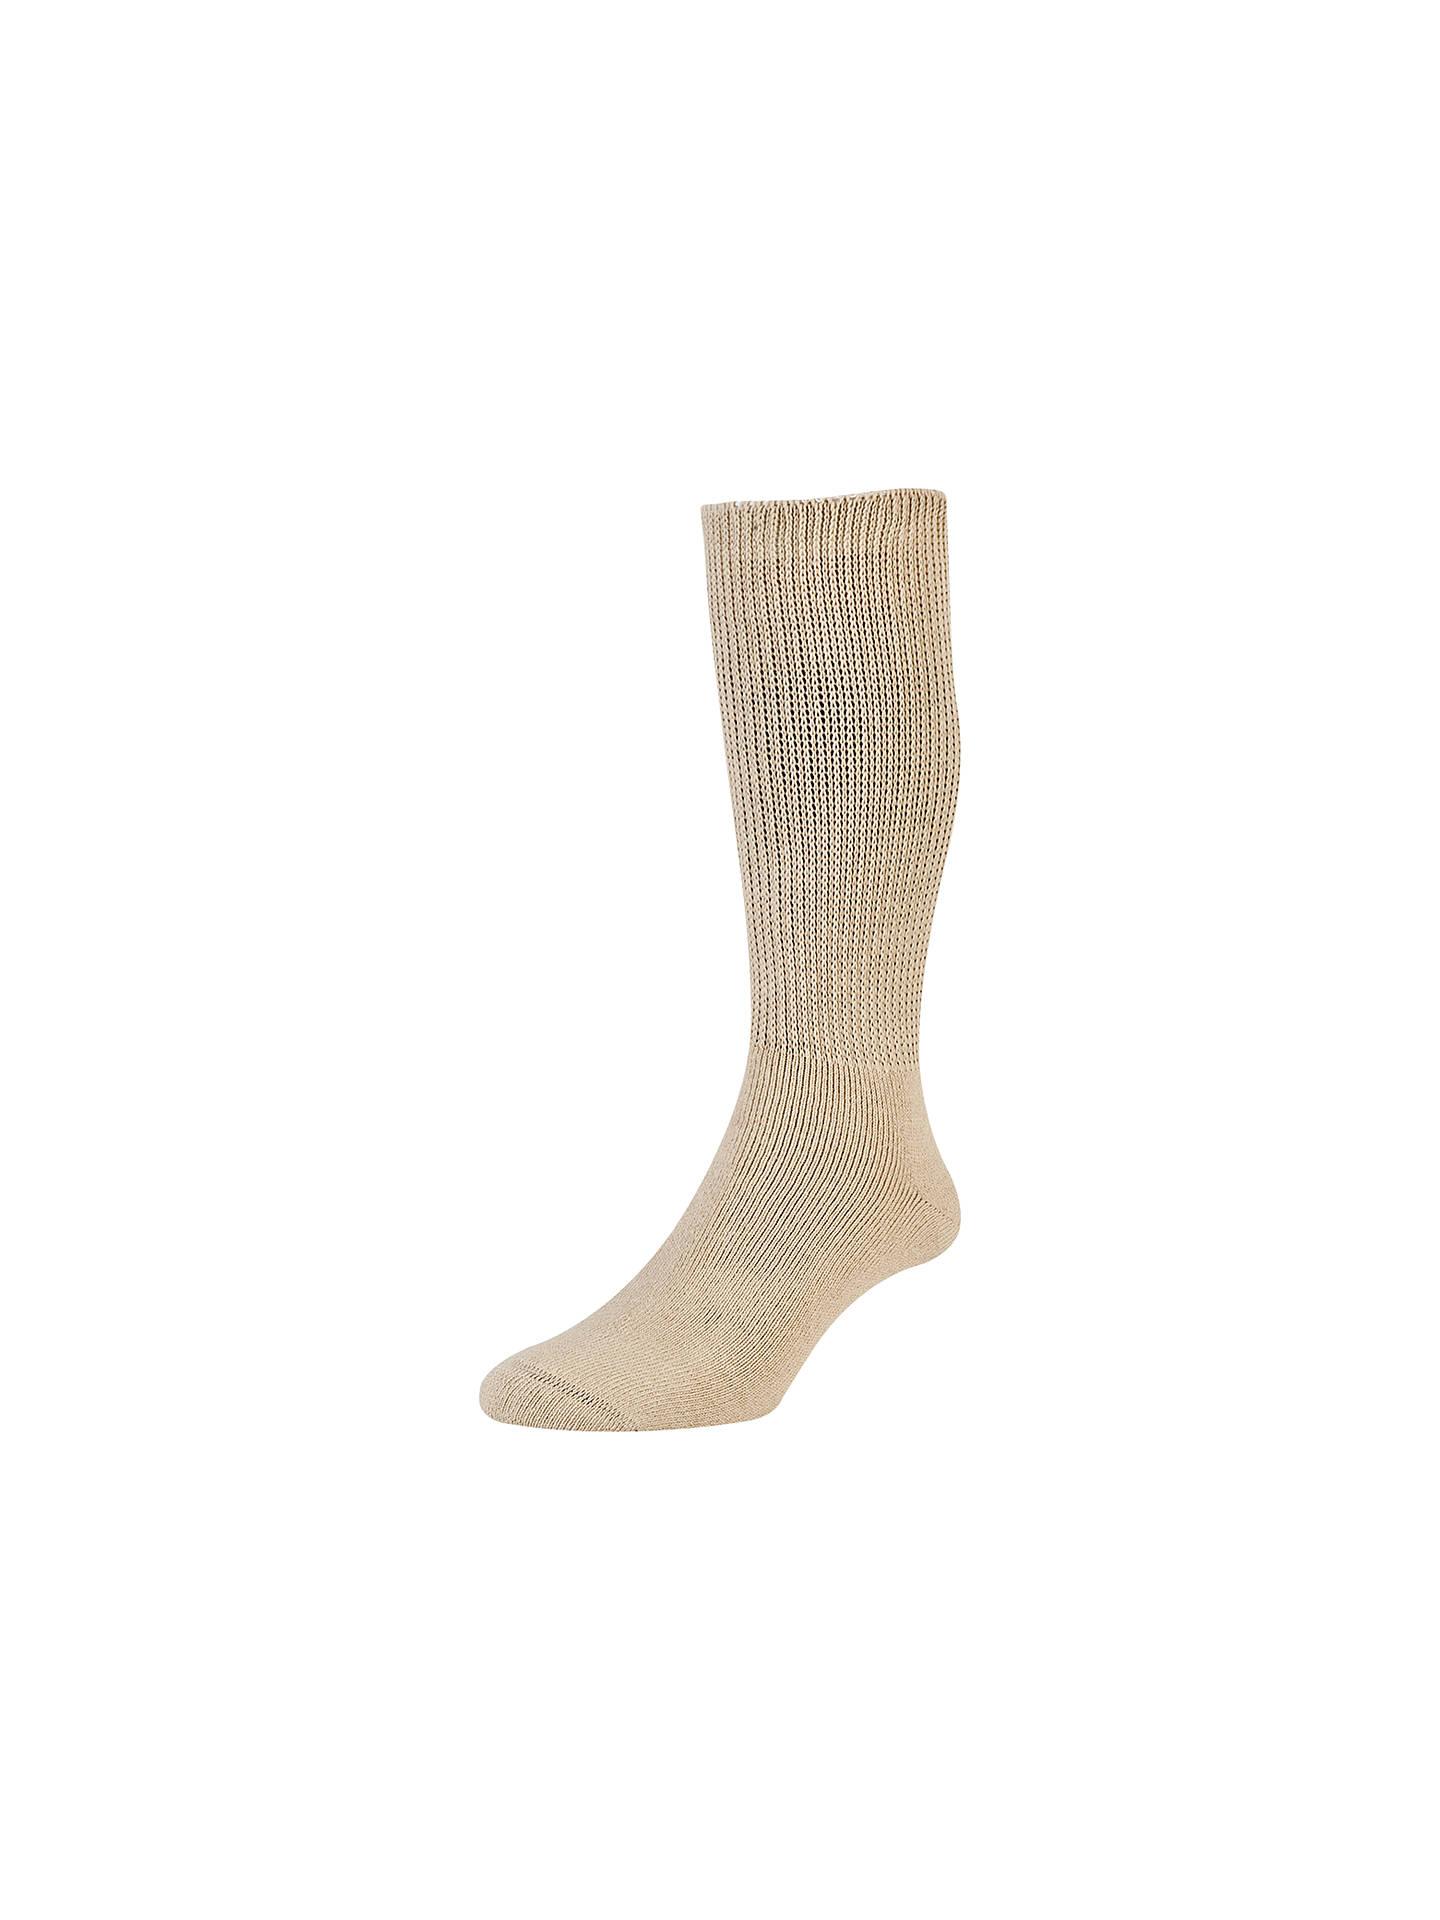 Hj Hall Diabetic Socks One Size At John Lewis Amp Partners